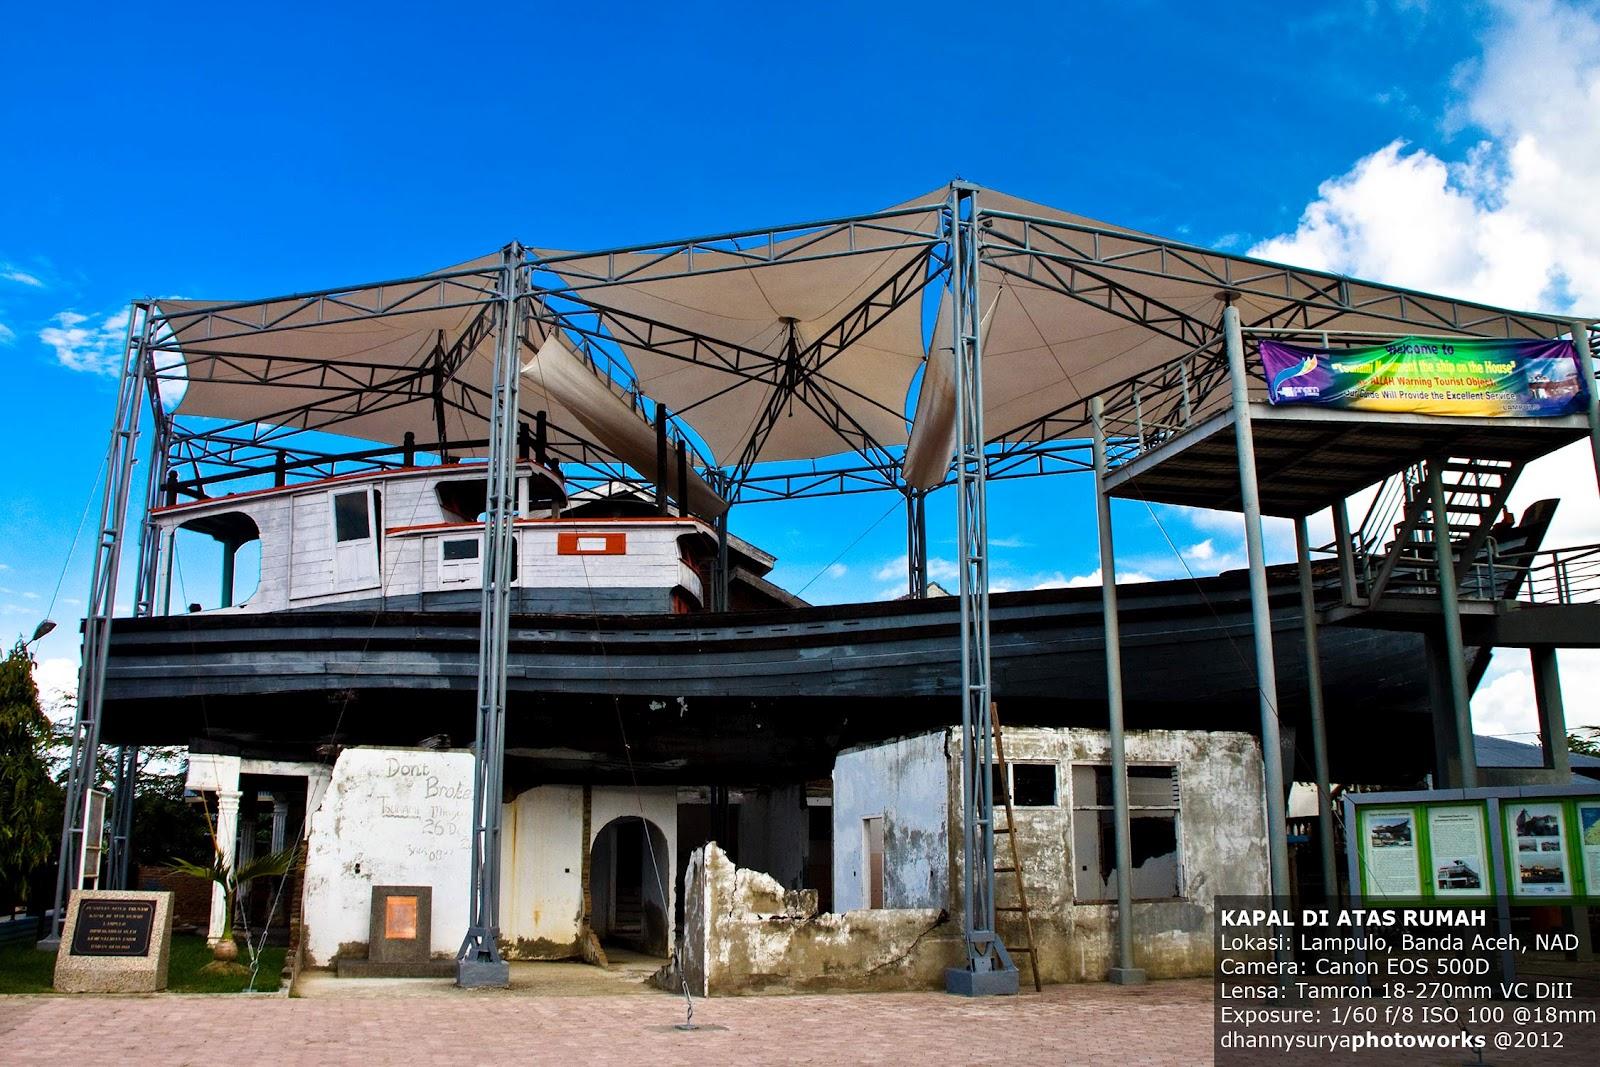 Kapal Ikan Boat Tersangkut Aceh Awesome Indonesia Tsunami Kota Banda